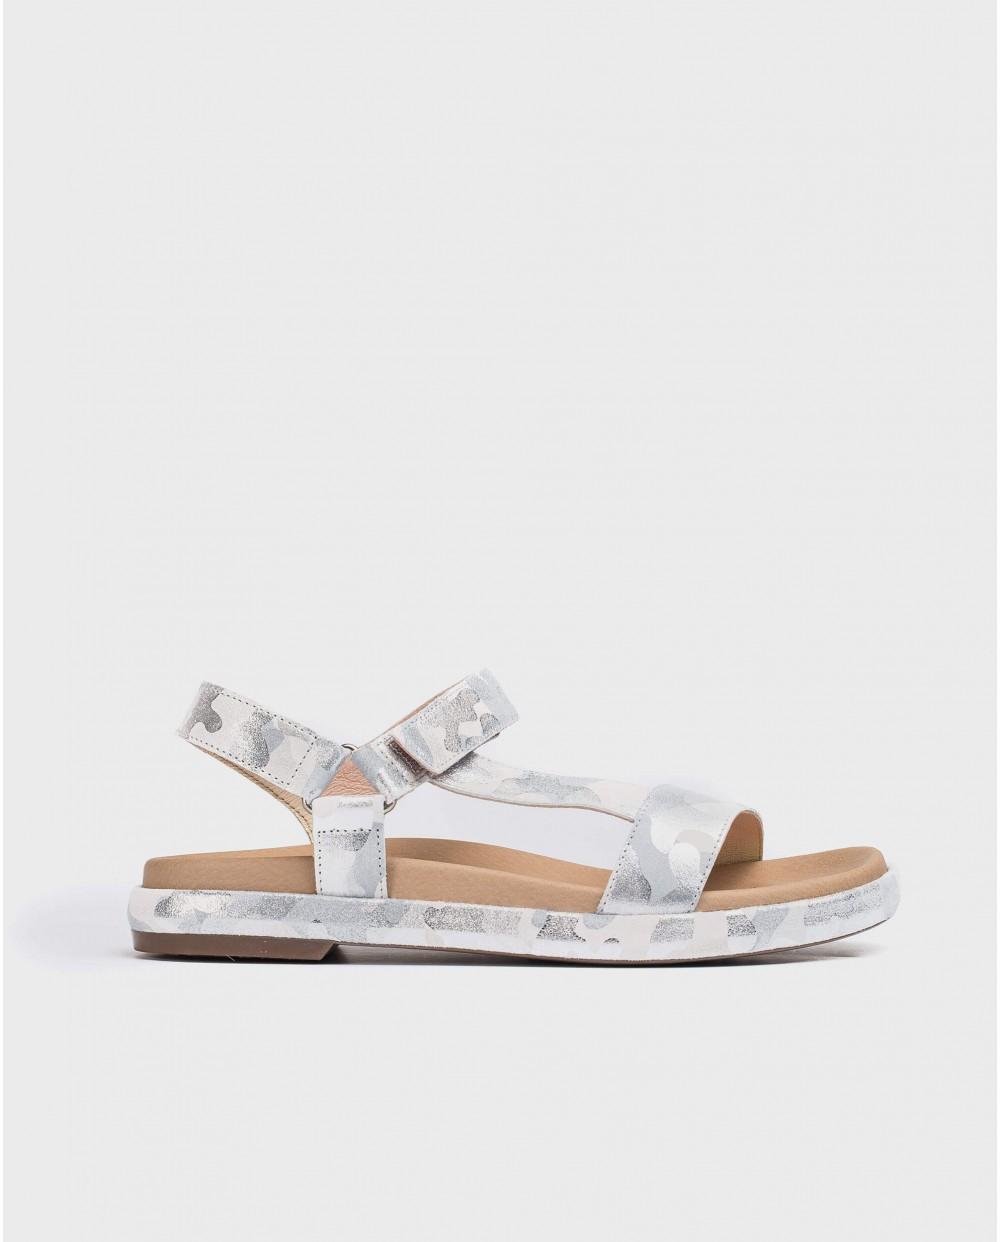 Embossed BIO sandal